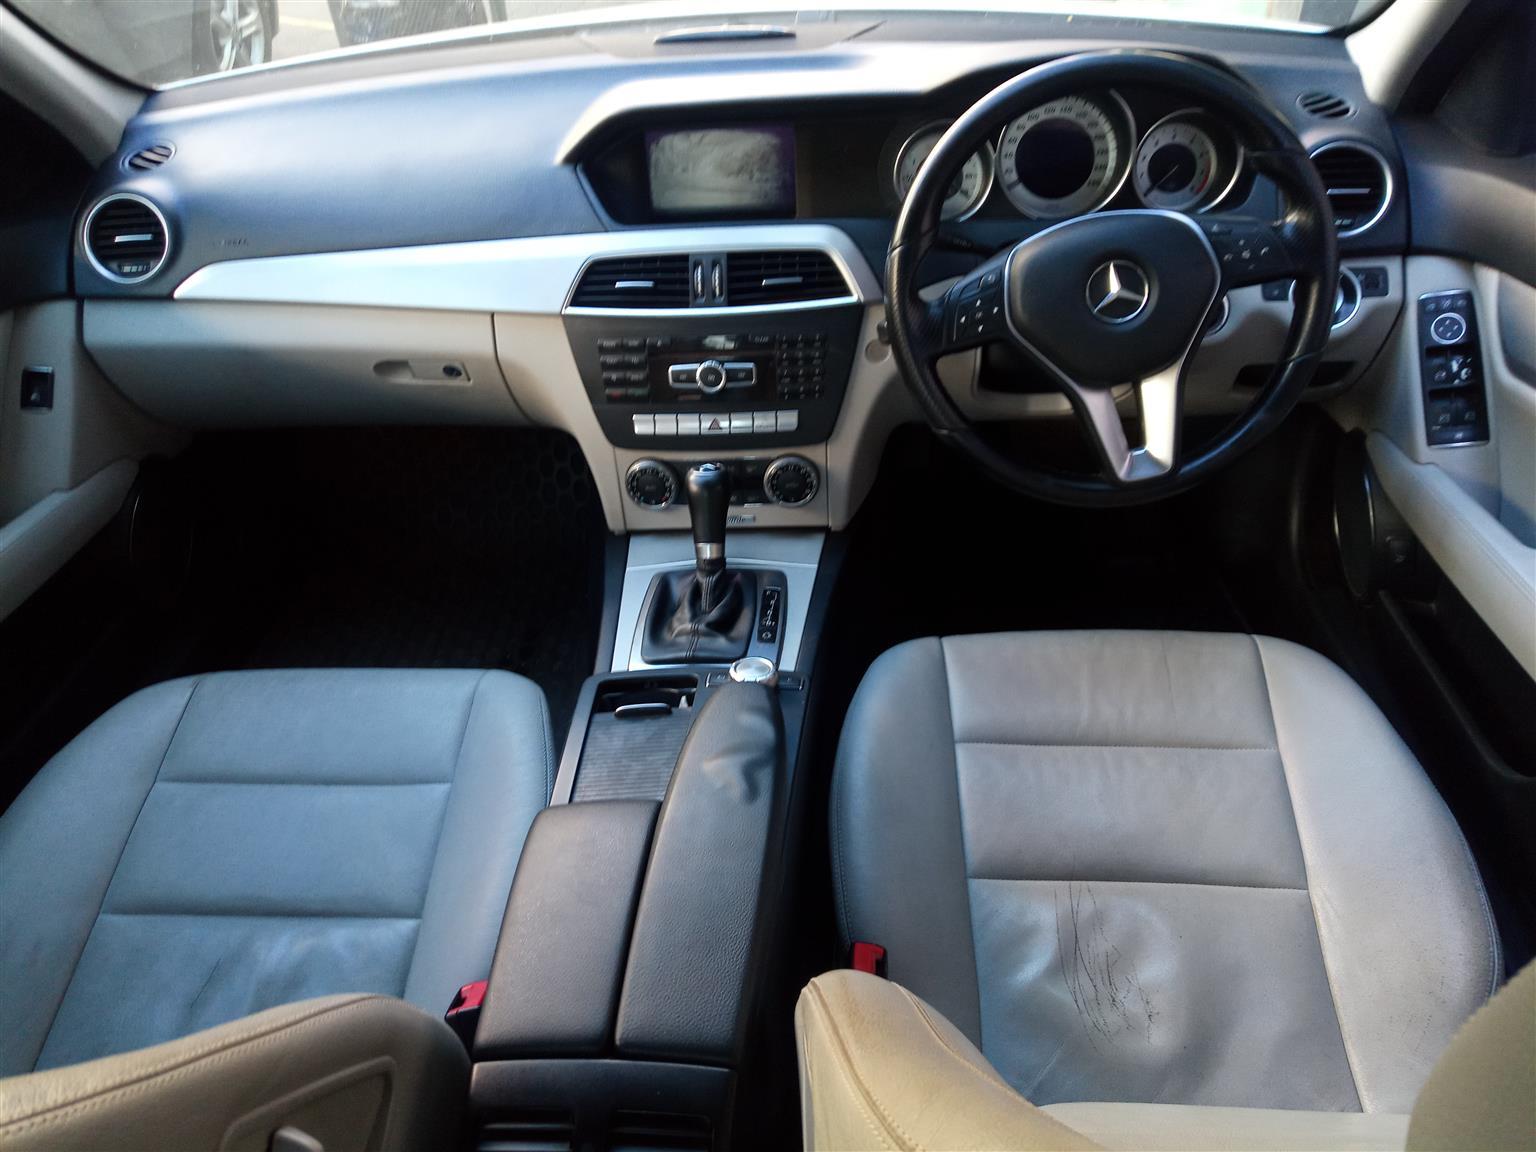 2012 Mercedes Benz C-Class C200 Edition C